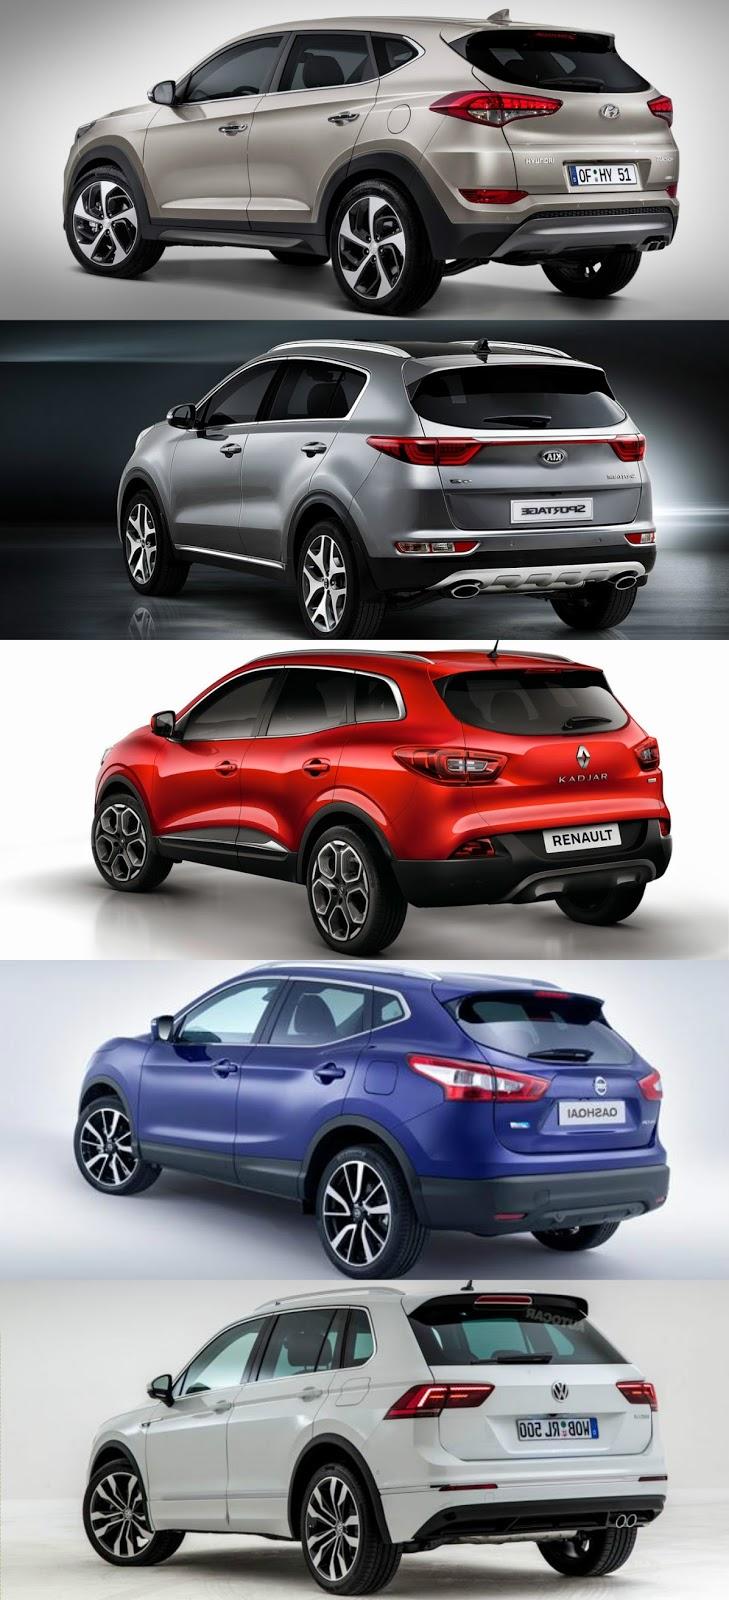 Hyundai tucson kia sportage nissan qashqai renault kadjar vw tiguan kar la t rmas sekizsilindir com